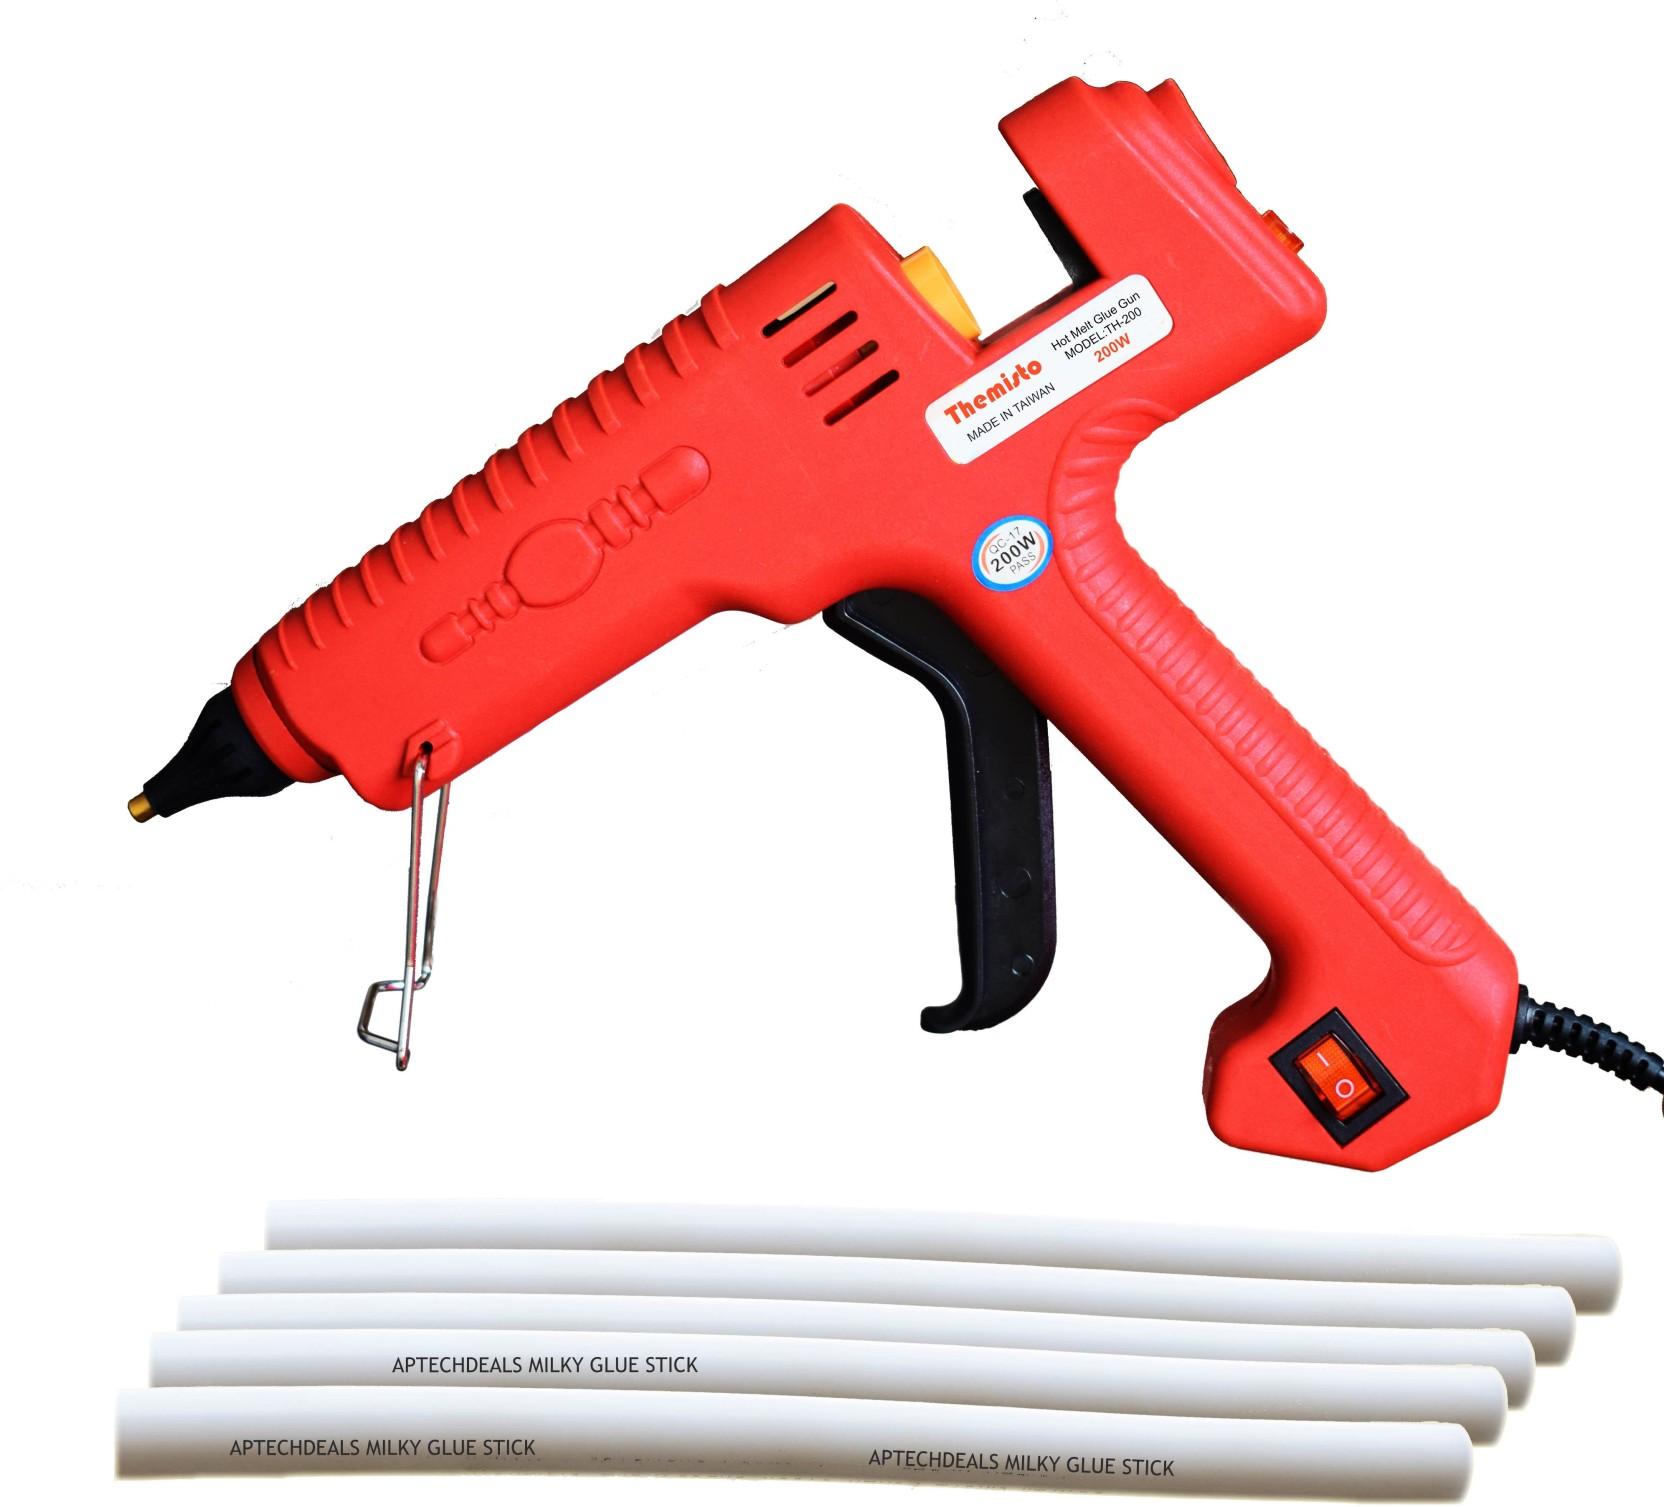 Themisto 200 W Industrial Glue Gun with 5 High Bonding Milky Glue